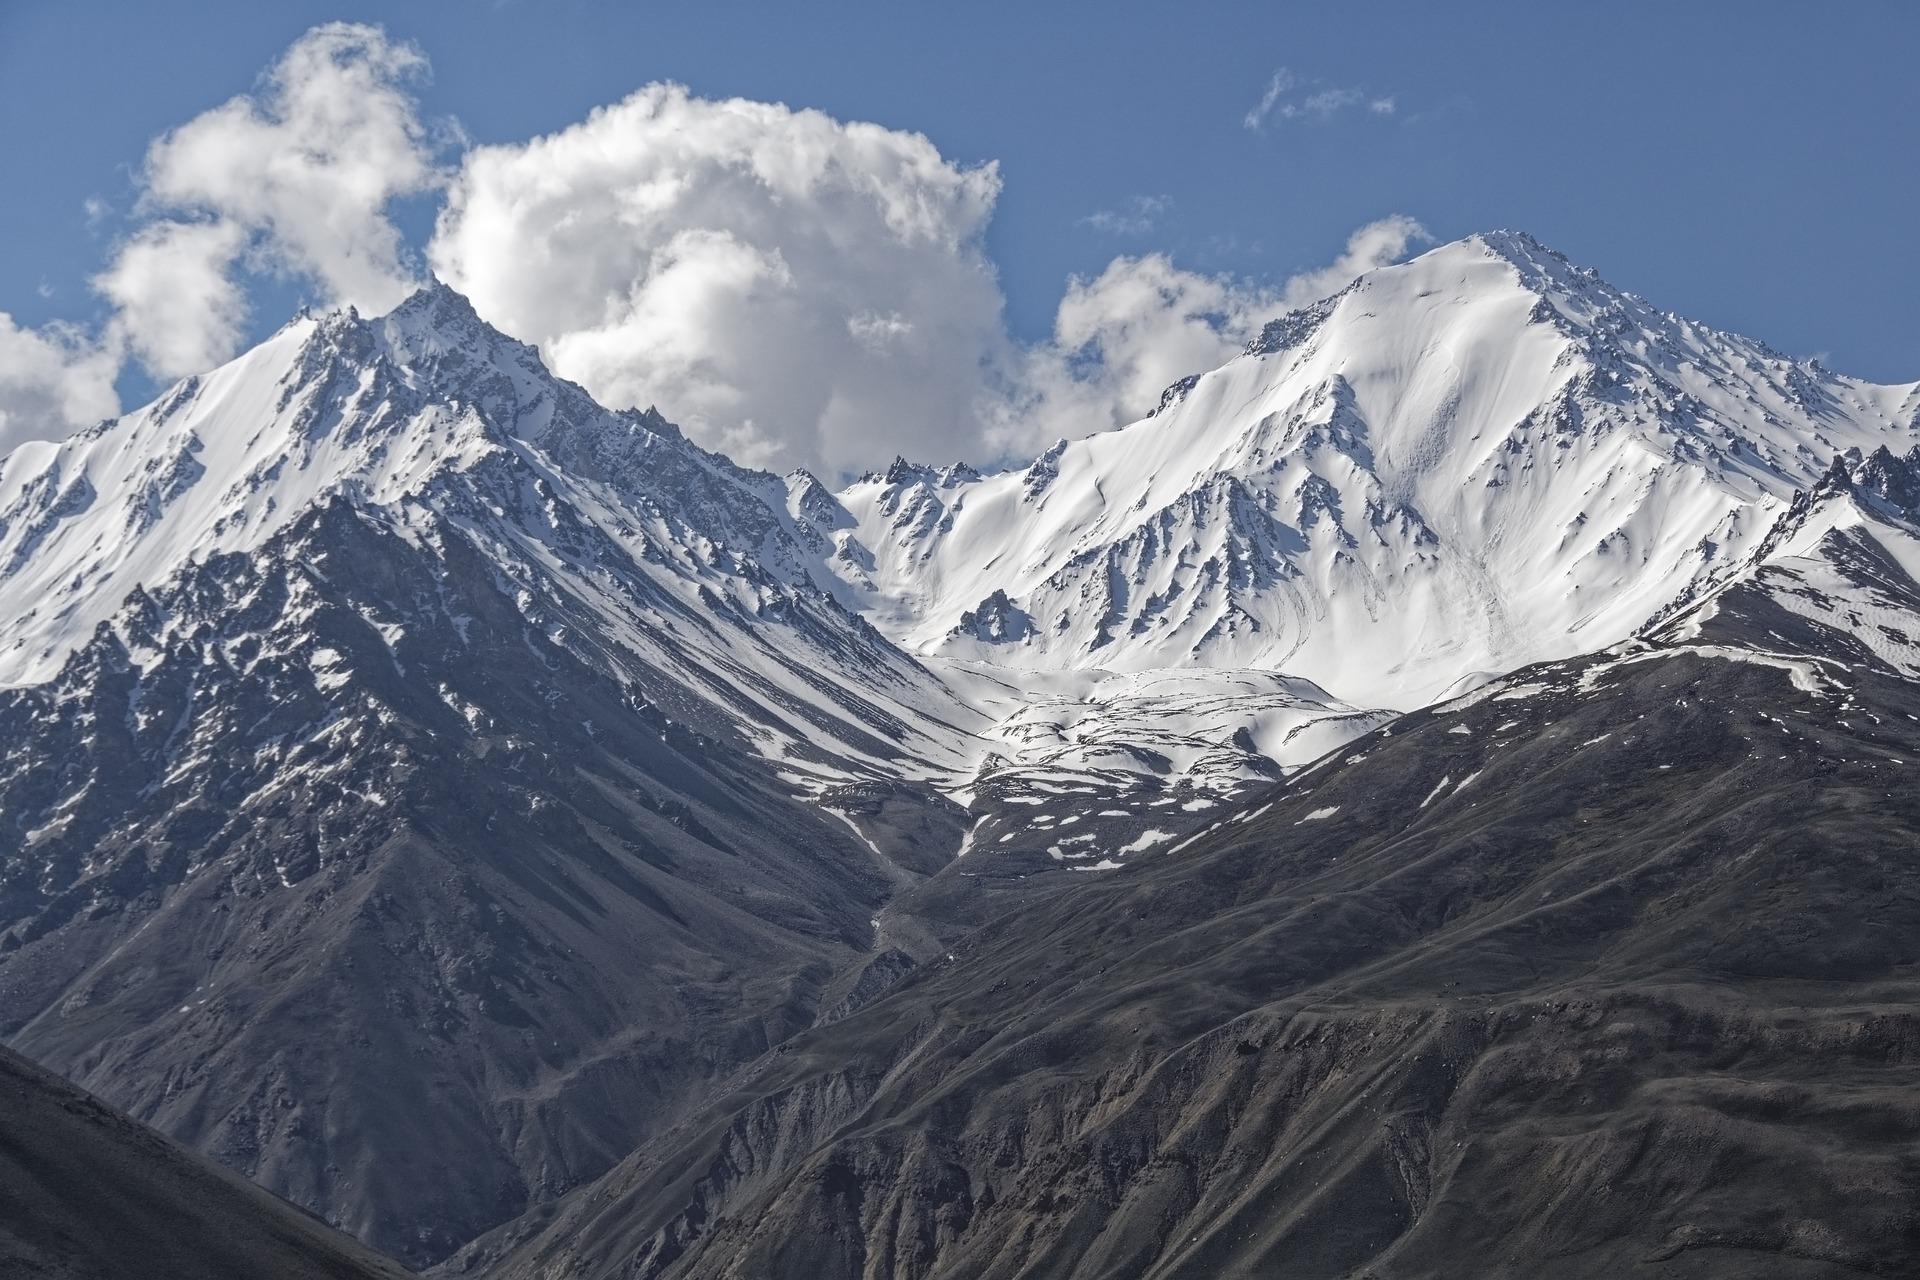 Trei romane inspirate din Afganistan, Si muntii au ecou